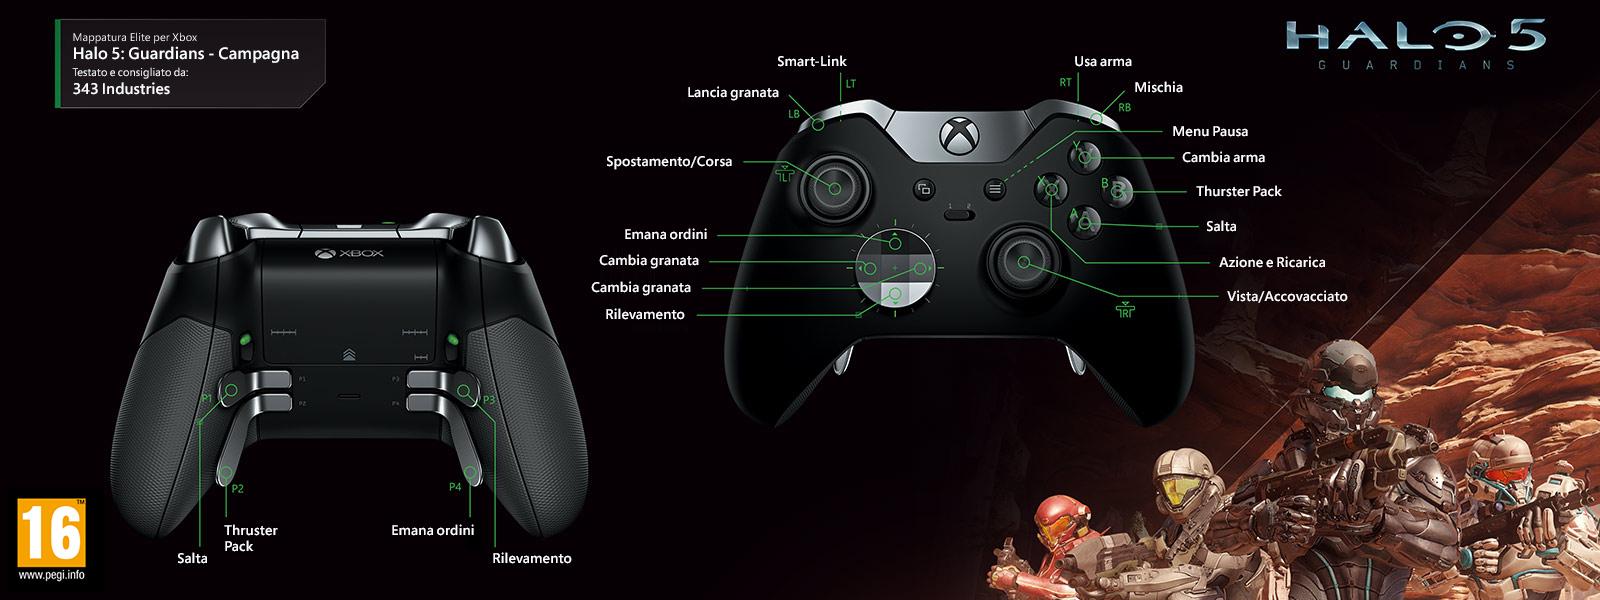 Halo 5: Guardians – Mappatura Elite per la Campagna